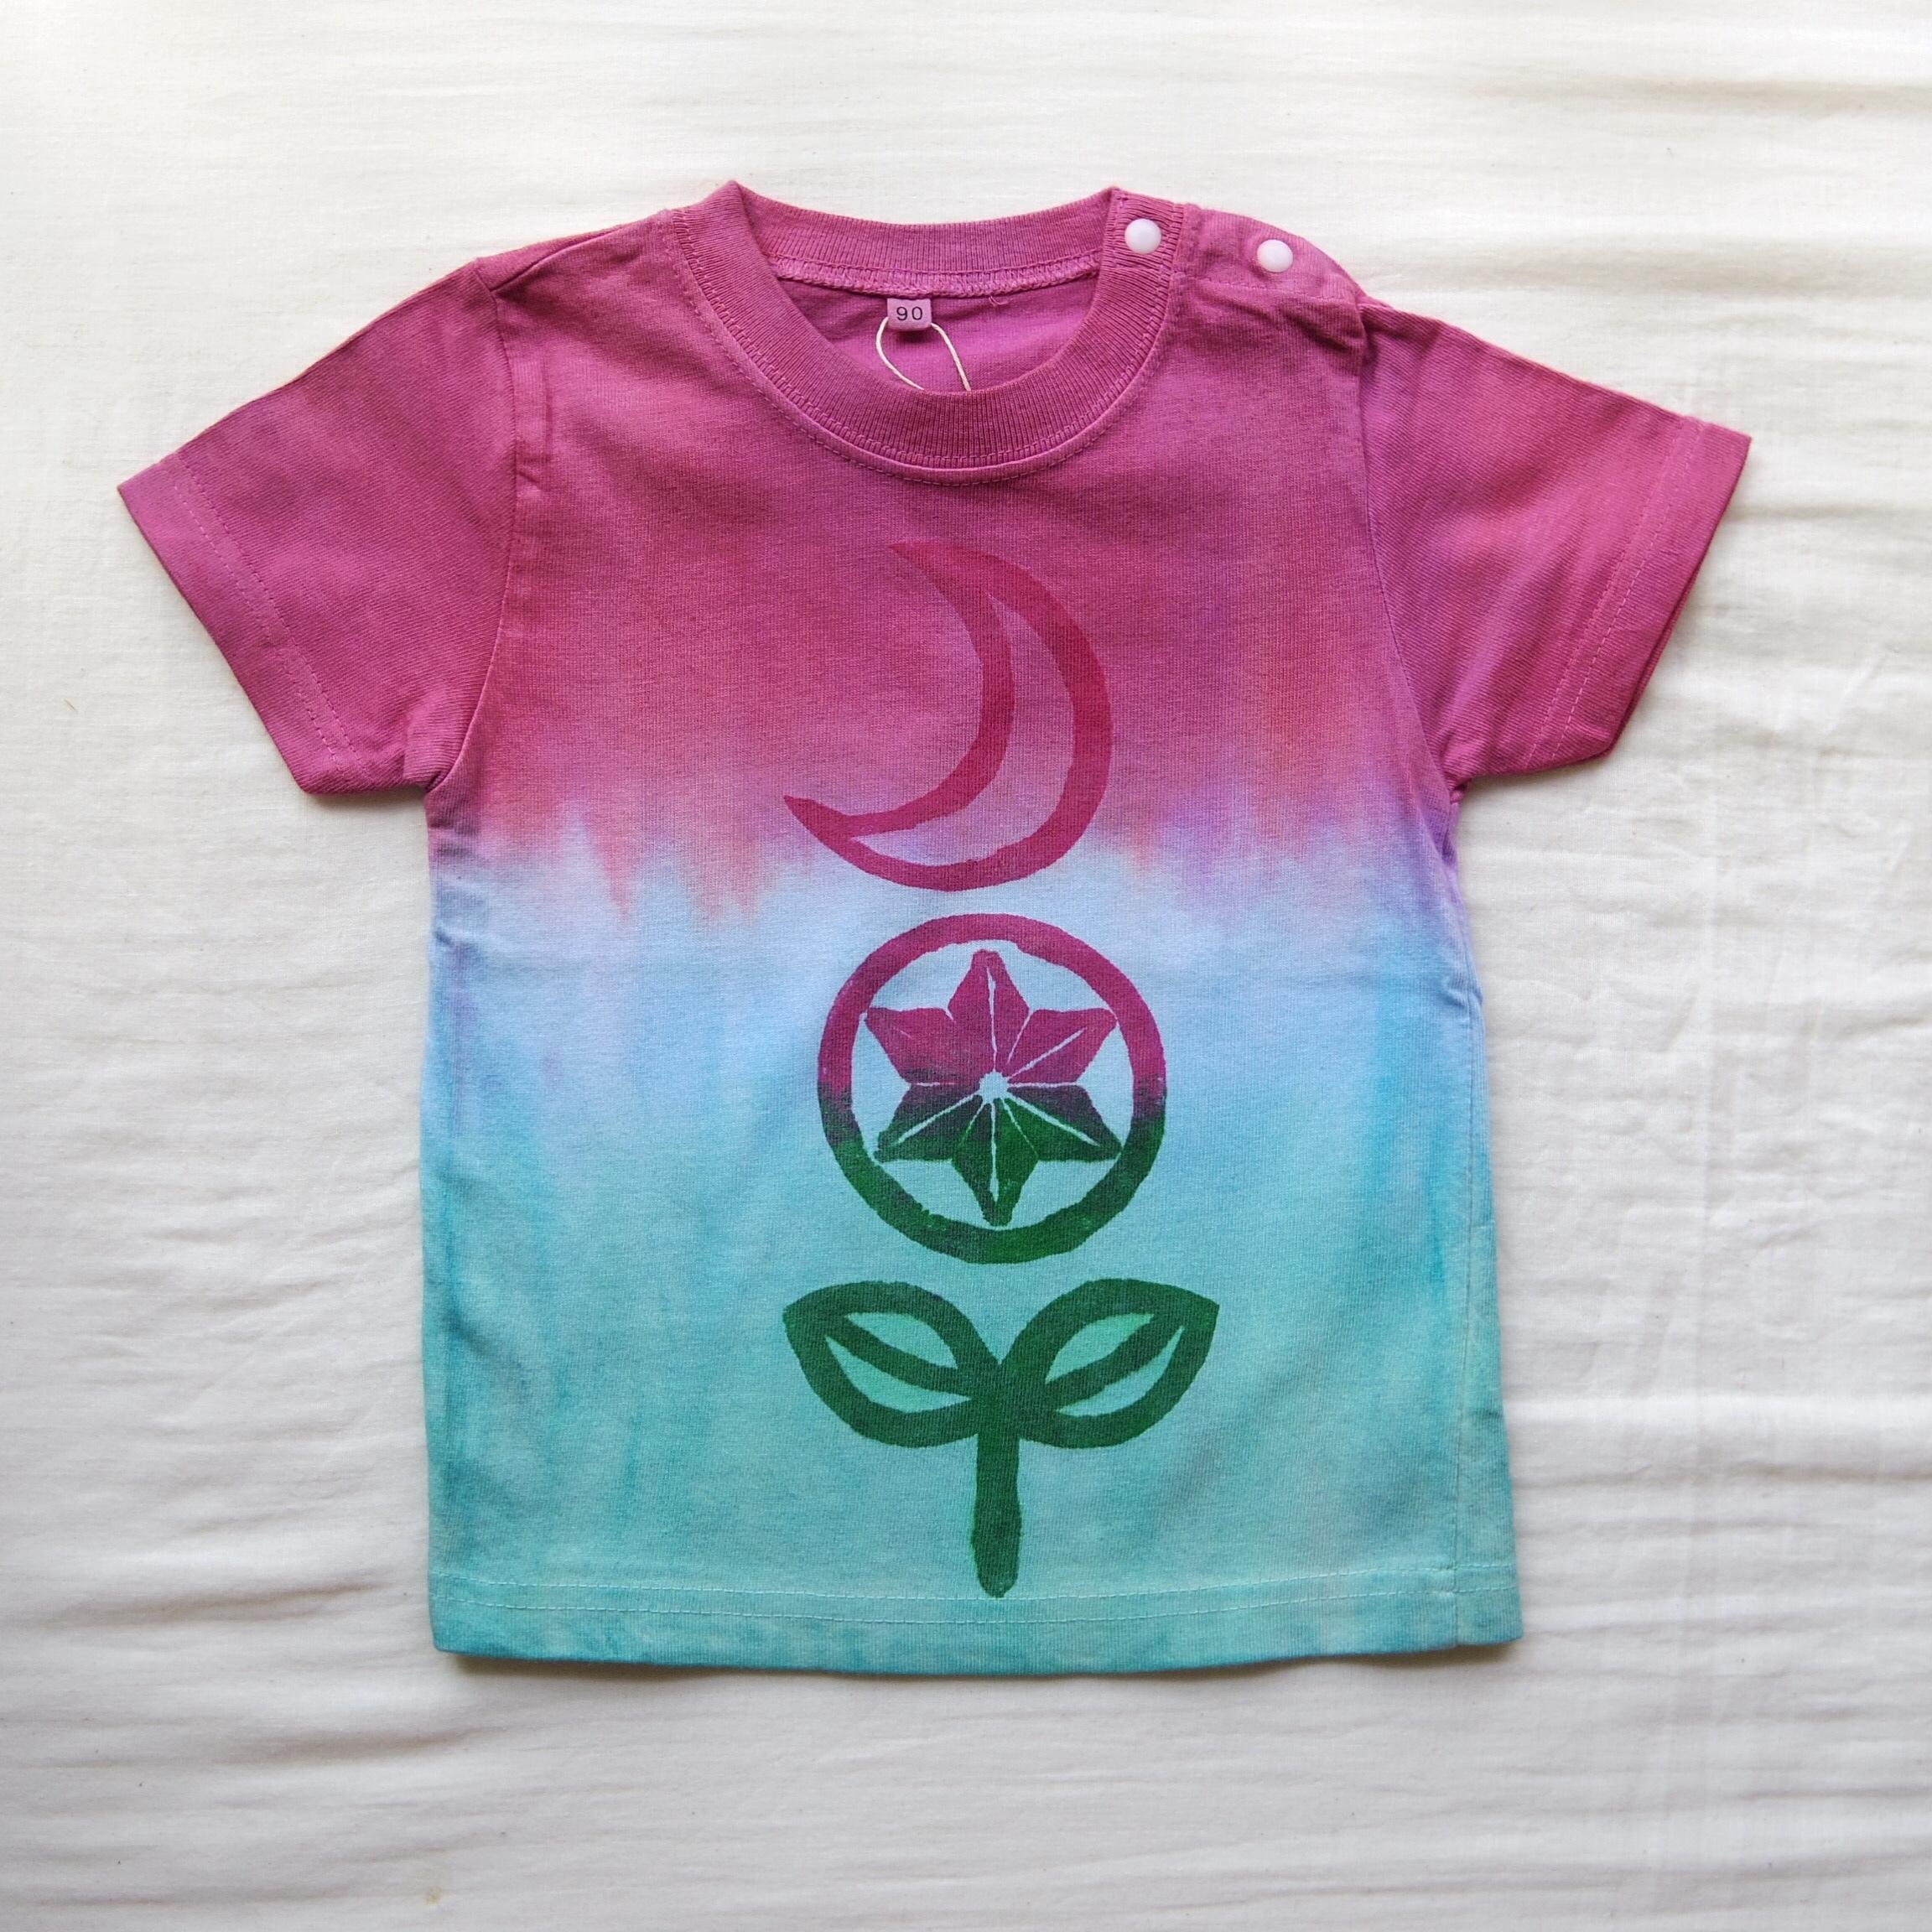 TKHOME 『JOY』 グラデーション キッズTシャツ 90cm